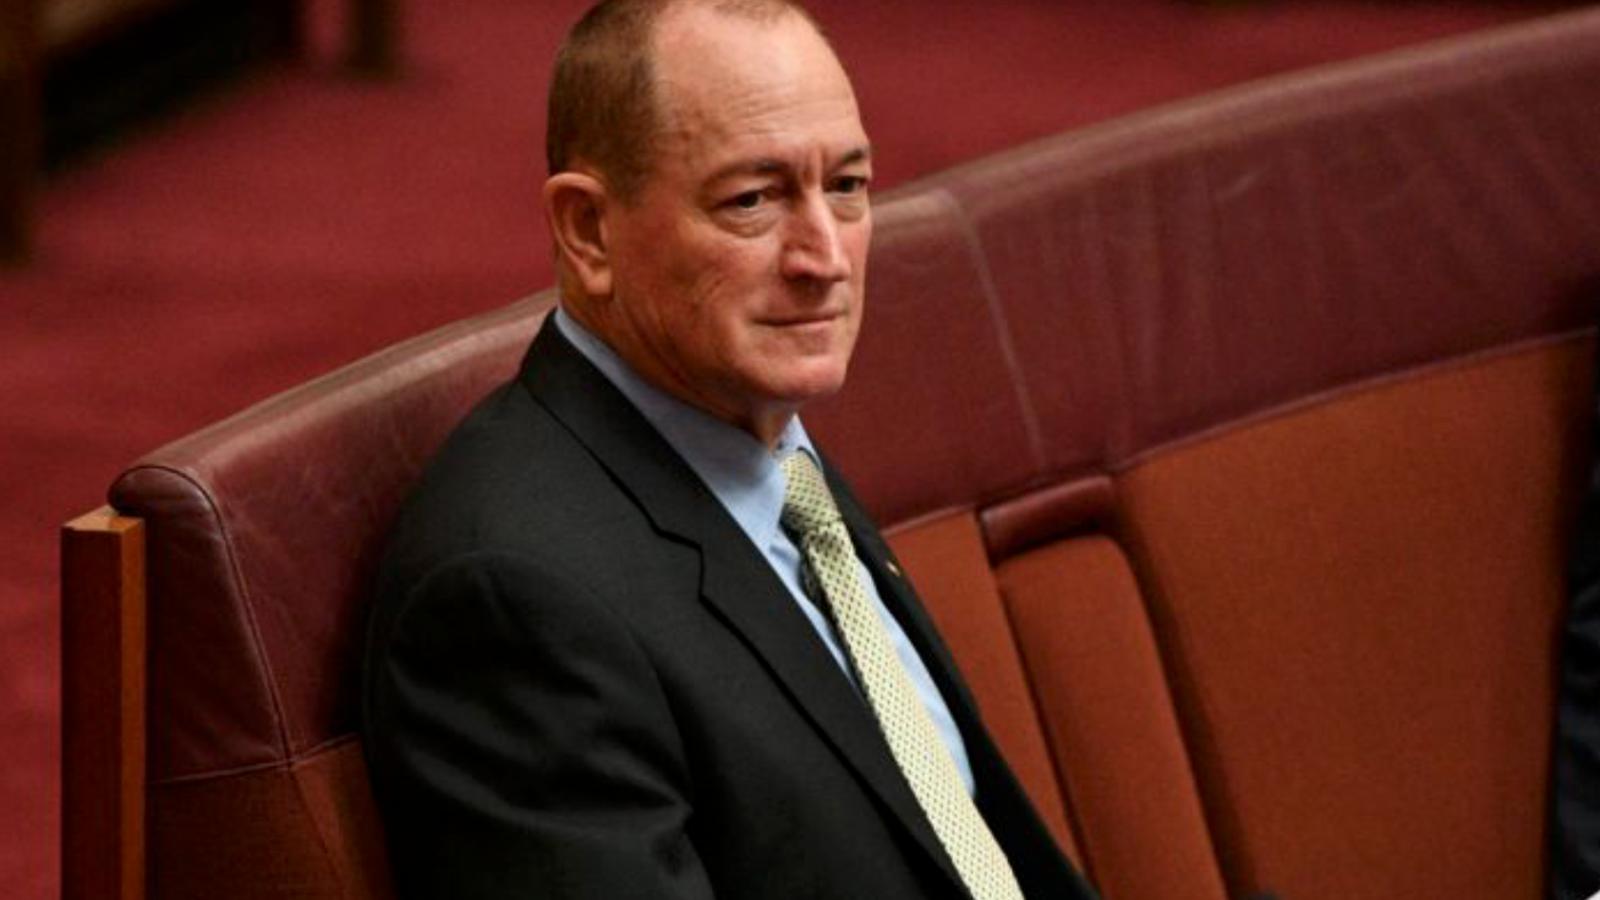 Fraser Anning Photo: Australian Senator Fraser Anning Blames Muslim Immigration